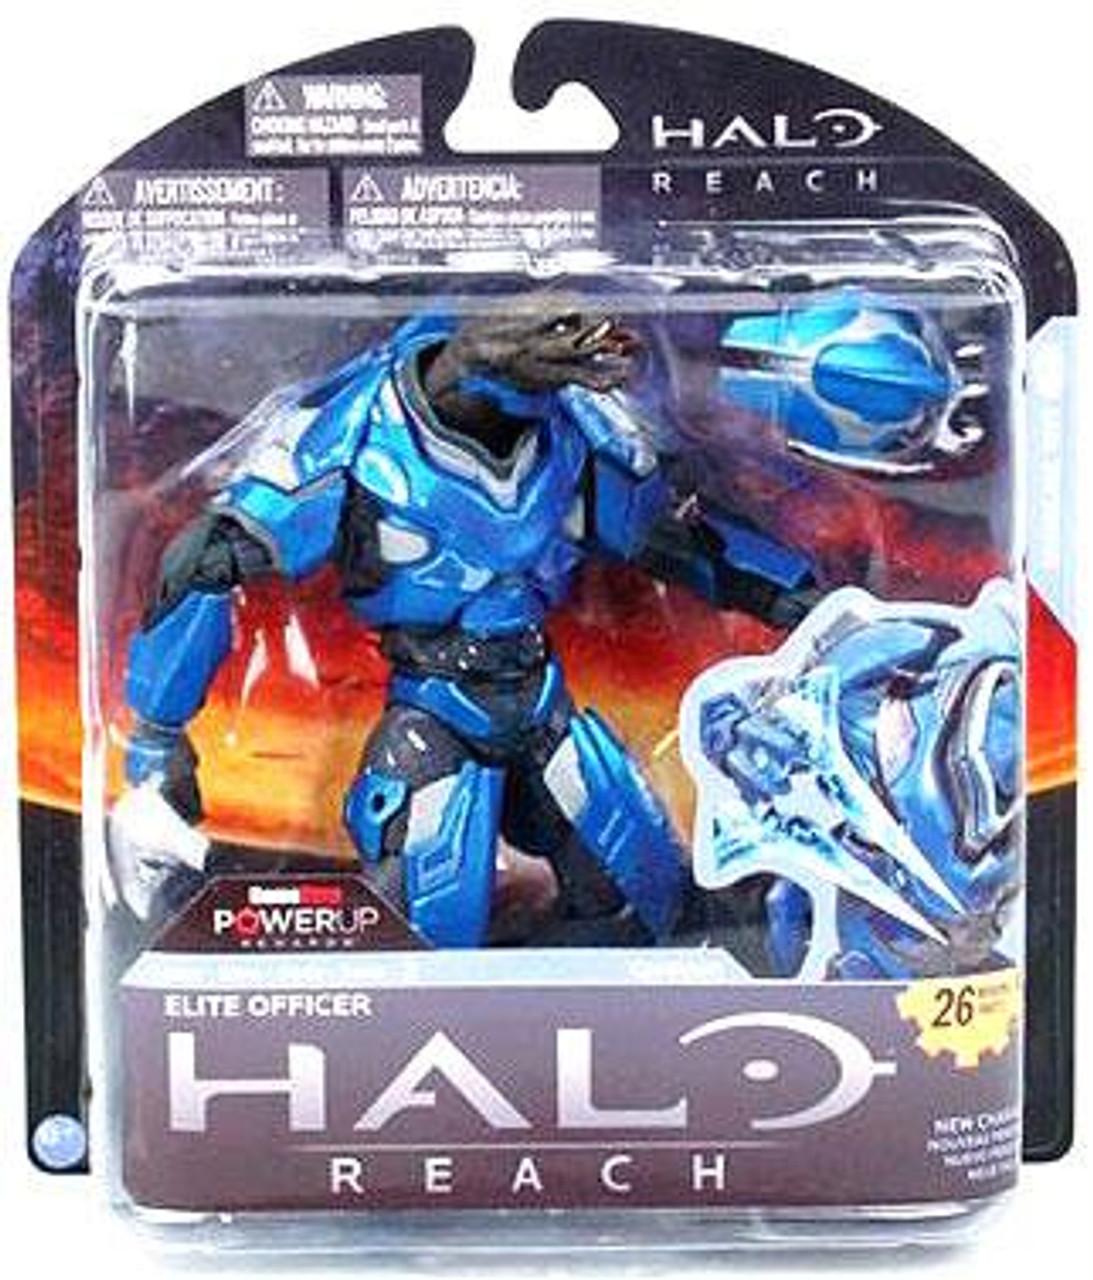 McFarlane Toys Halo Reach Series 2 Elite Officer Exclusive Action Figure [Blue]